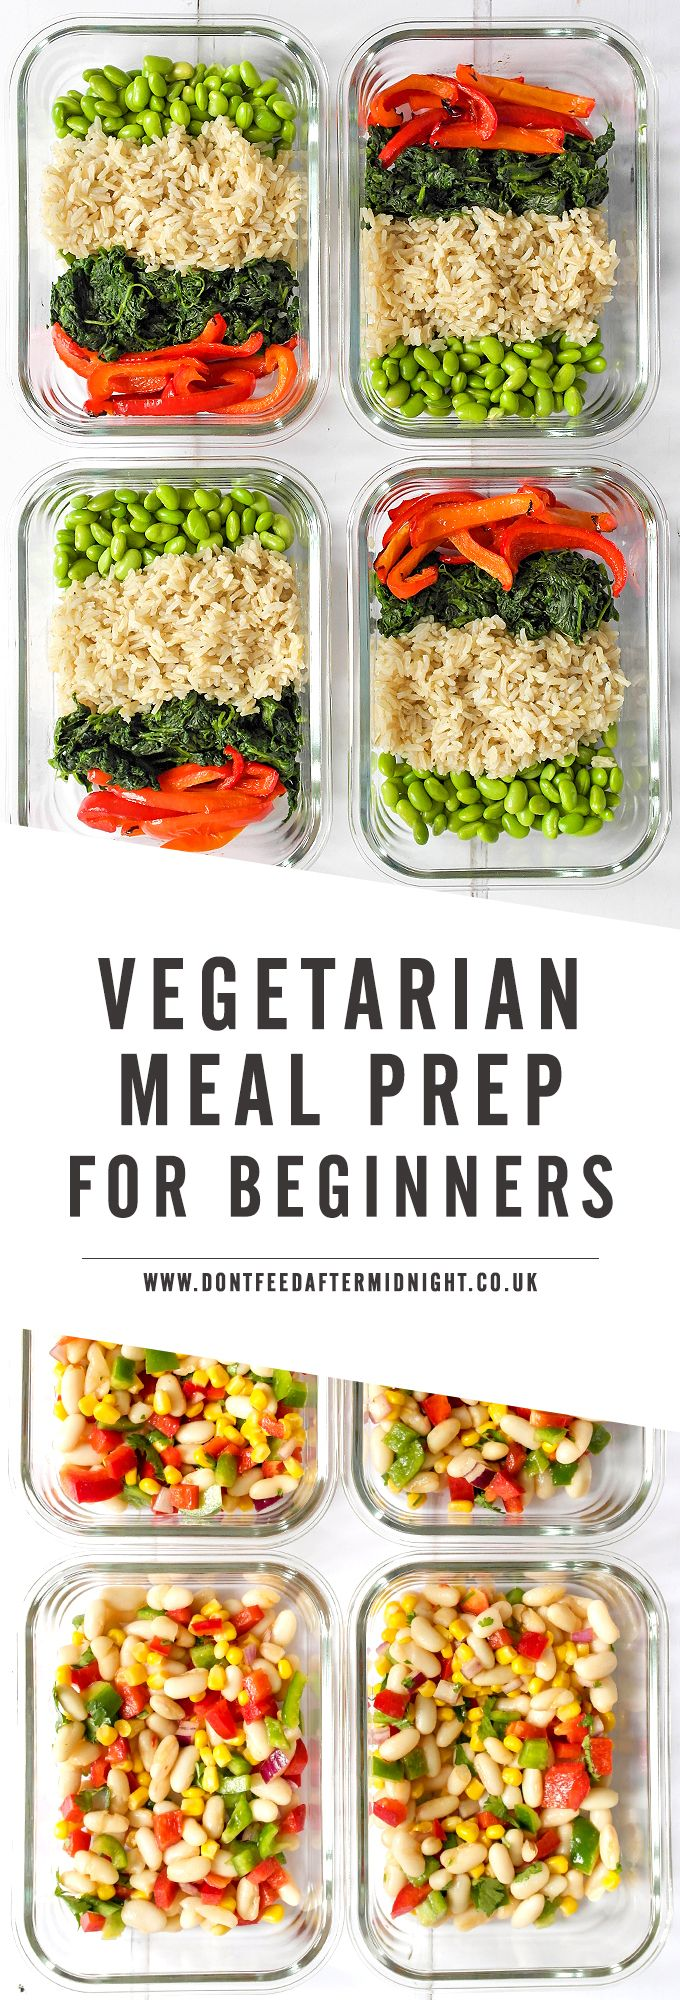 Dontfeedaftermidnight Co Uk Vegetarian Meal Prep Veggie Meal Prep Vegetarian Meal Plan